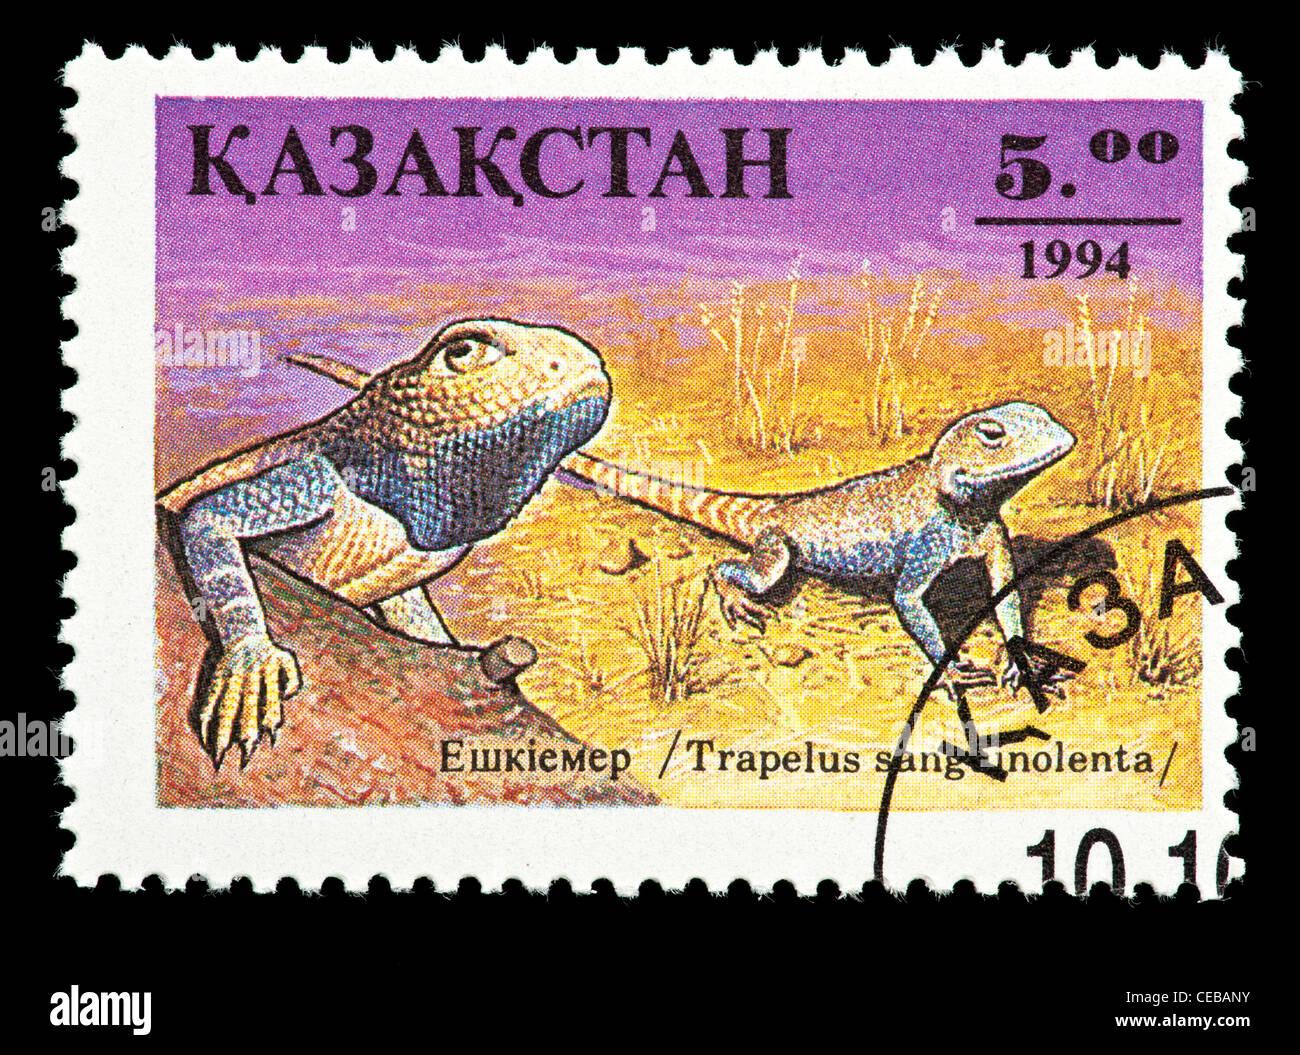 Postage stamp from Kazakhstan depicting a small lizard (Trapelus sanguinolenta) - Stock Image